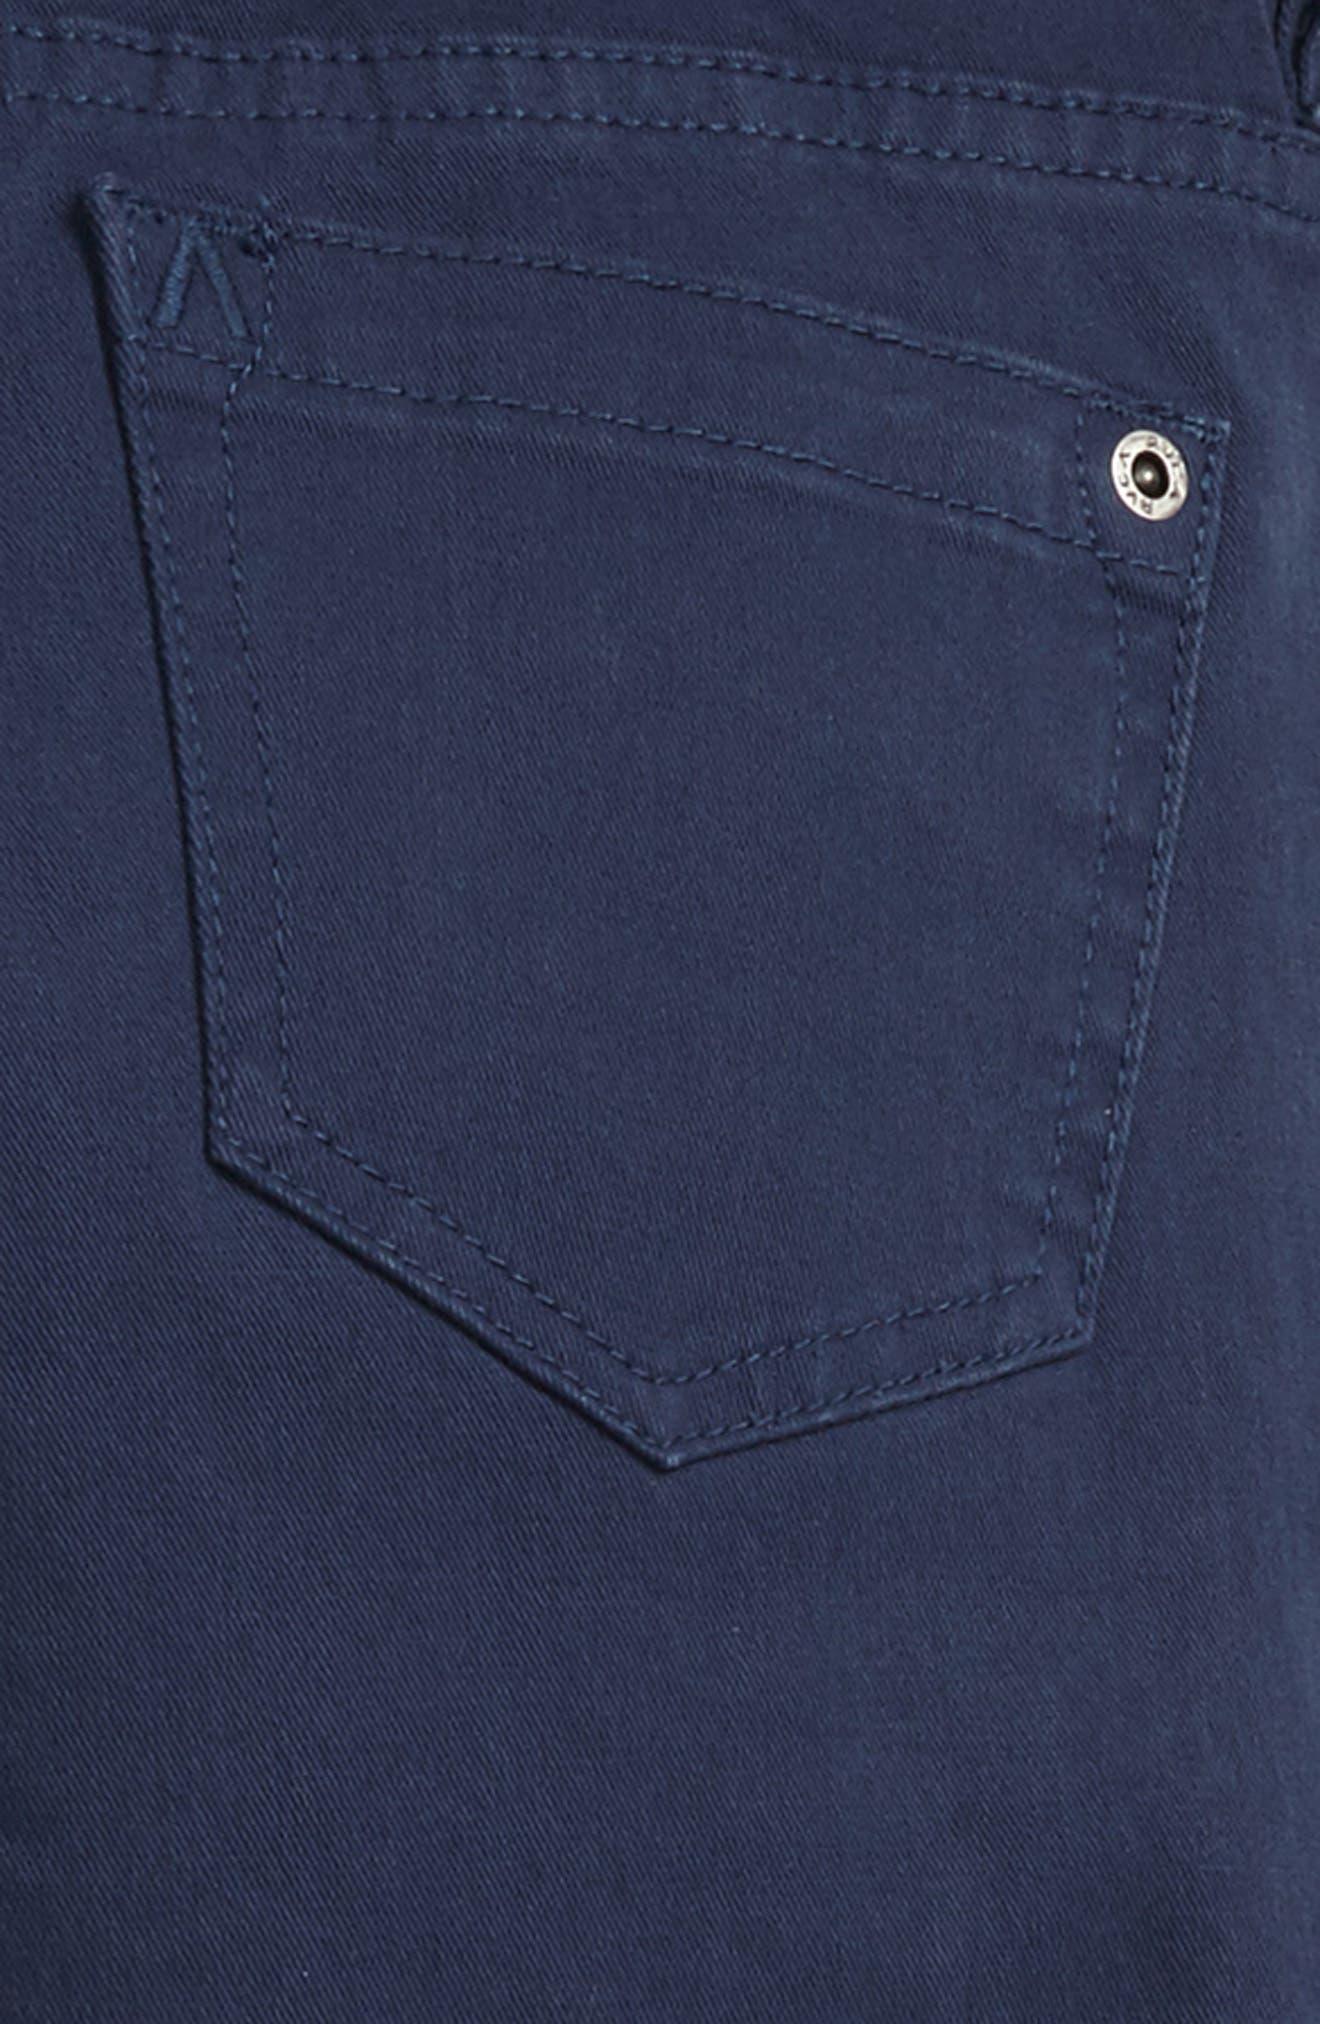 'Daggers' Slim Fit Twill Pants,                             Alternate thumbnail 10, color,